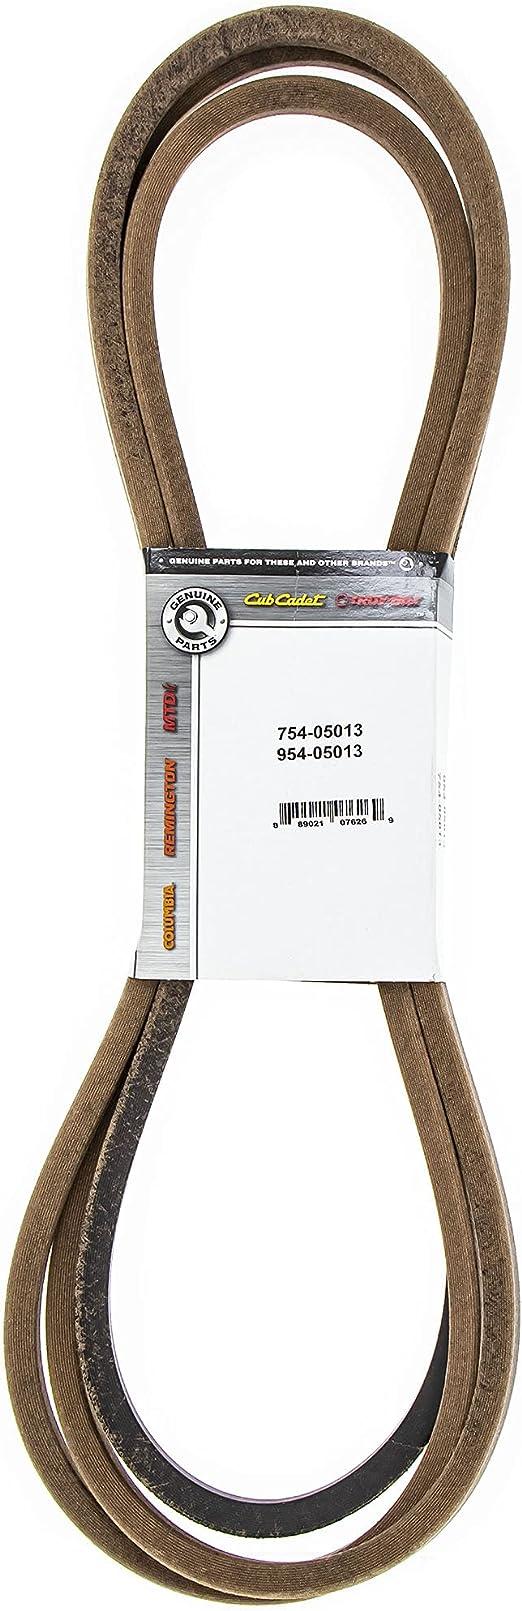 CUB CADET 954-04083 V Belt B Sec X 136 Lg Gt GT 1054 GTX OCC-754-04083 754-04083